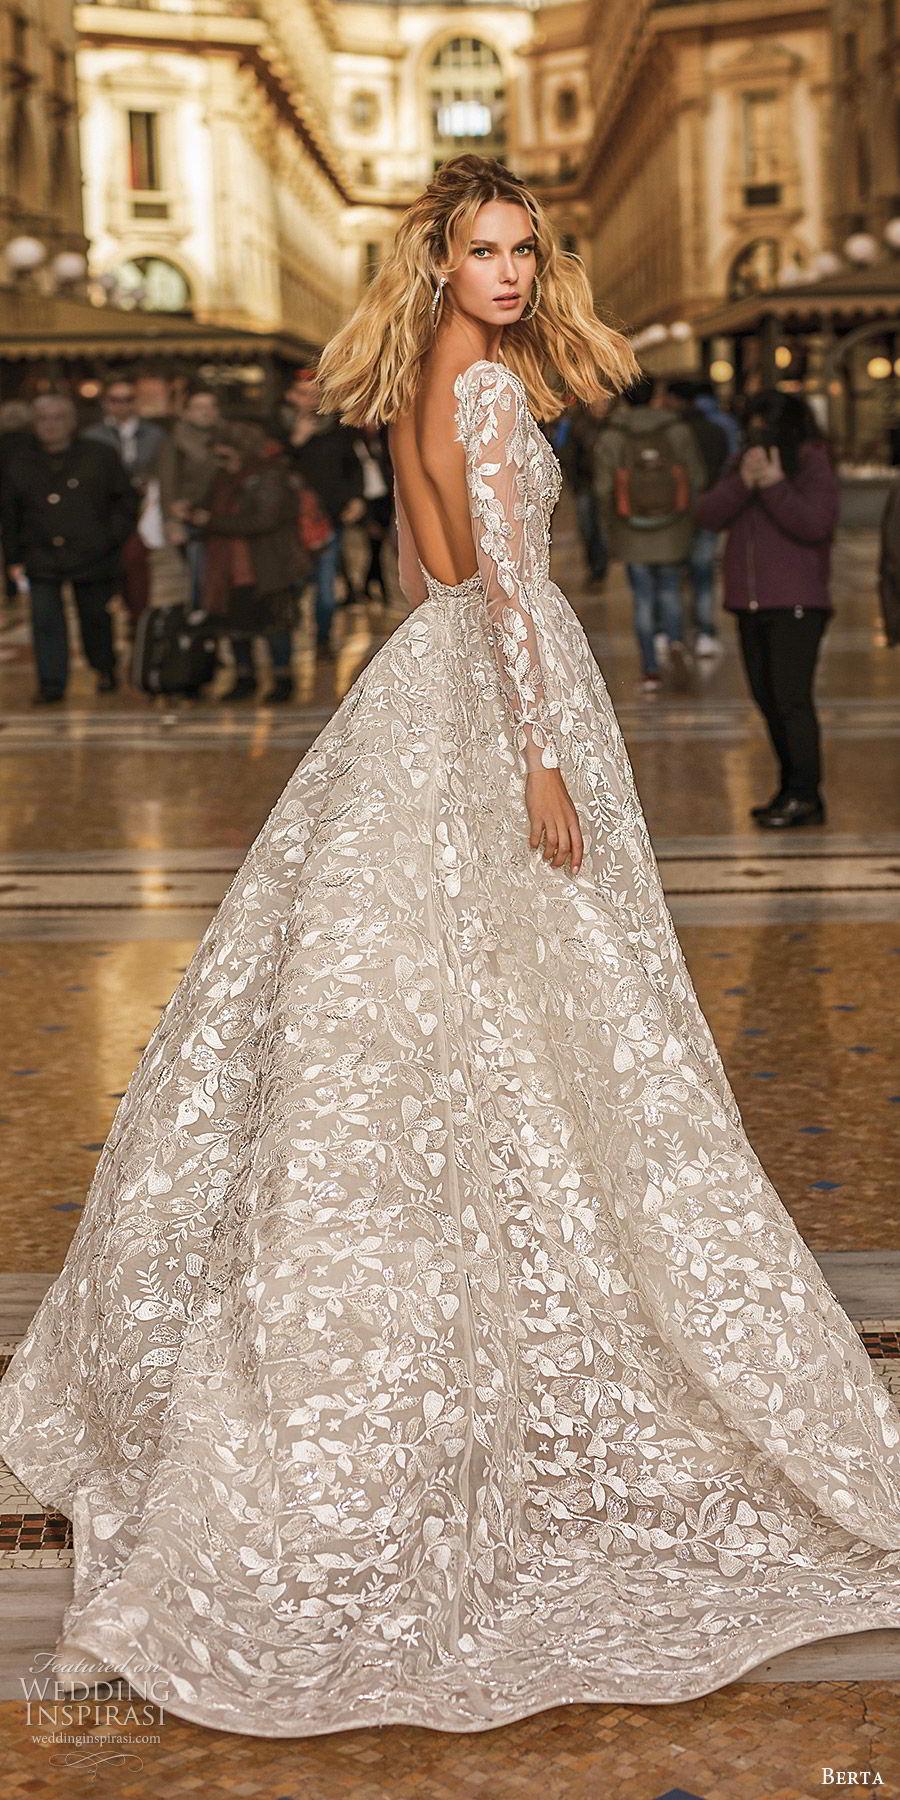 berta spring 2020 bridal illusion long sleeves deep v neck fully embellished a line ball gown wedding dress (11) romantic elegant chapel train bv